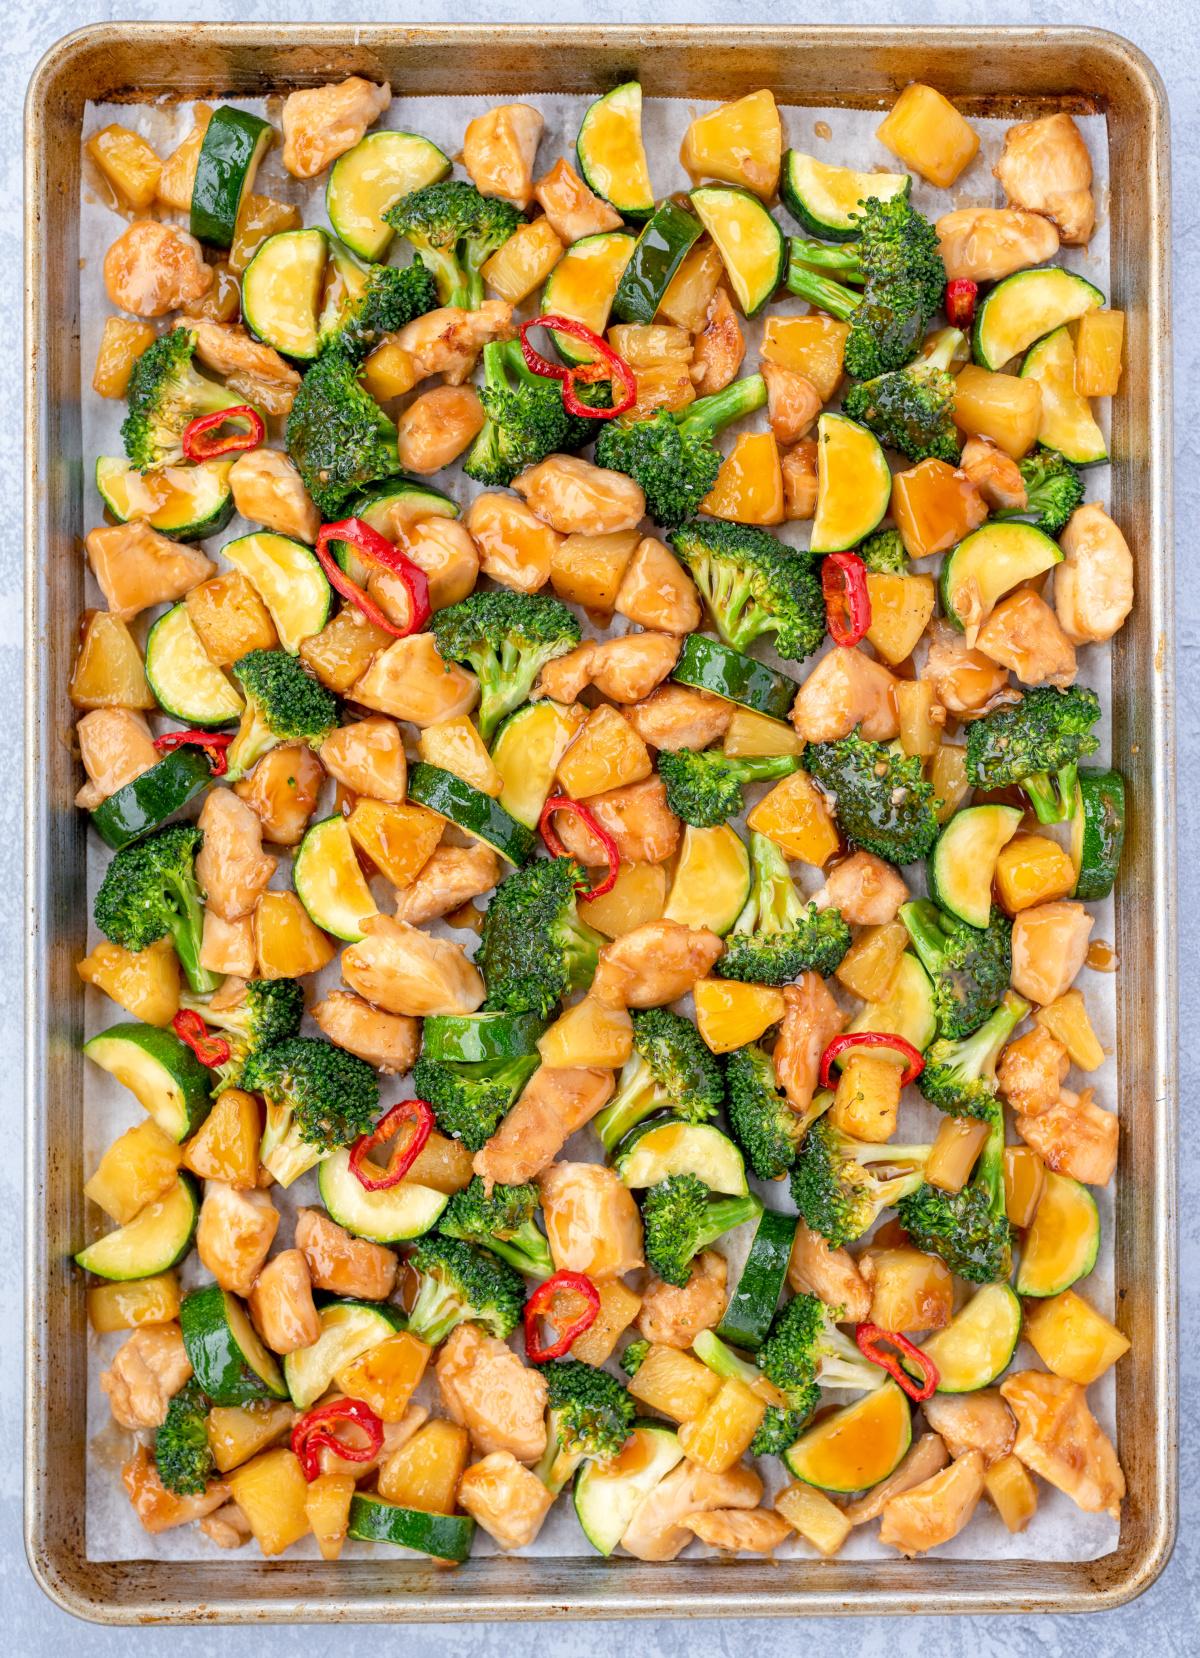 sheet pan chicken teriyaki with broccoli, zucchini and pineapple